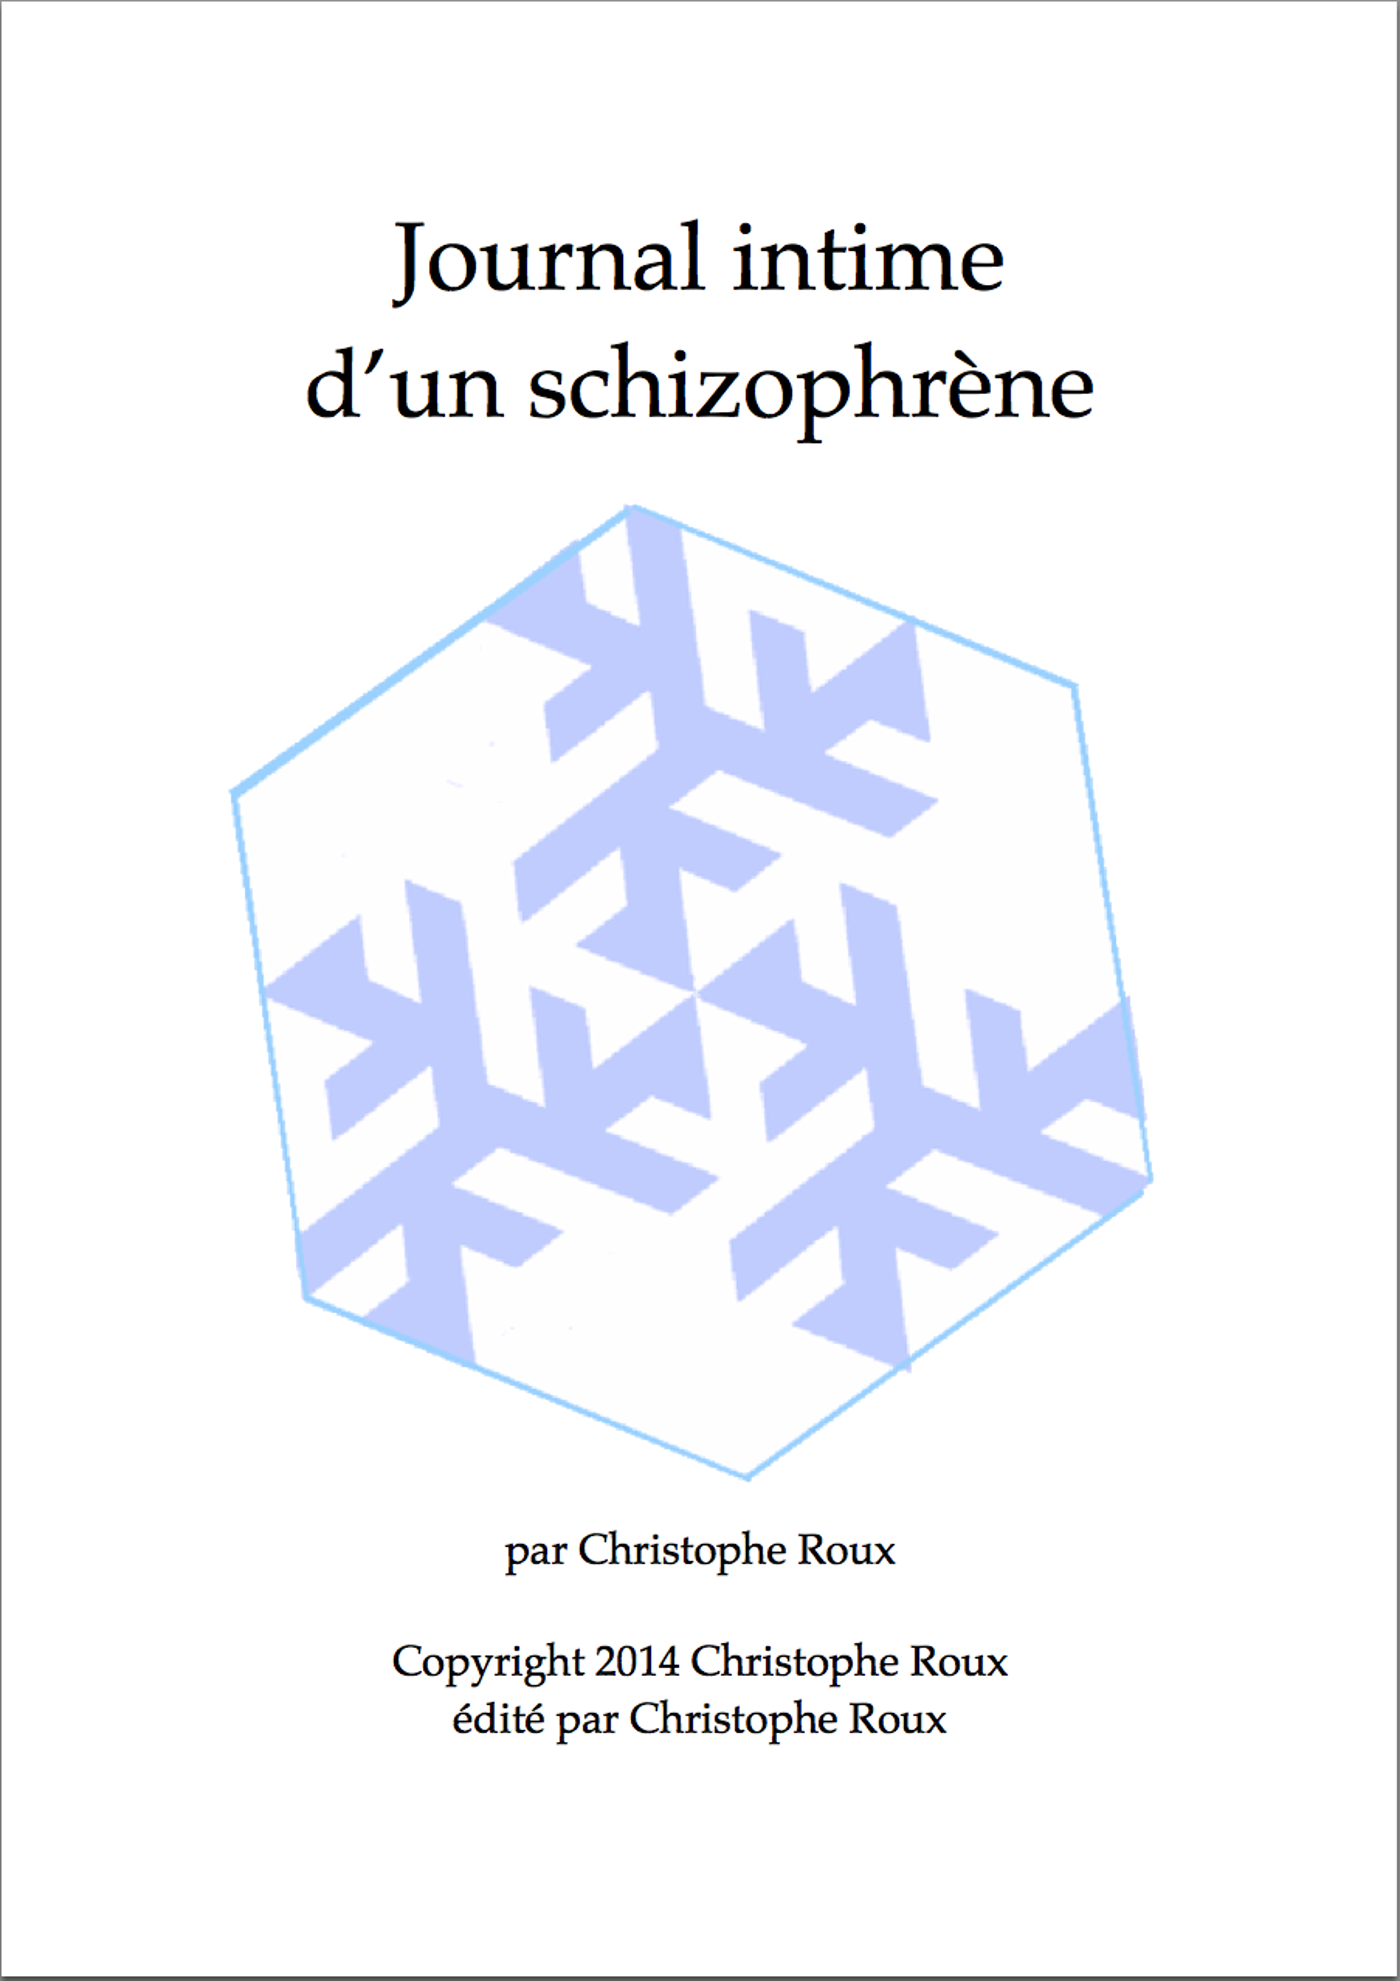 File:Journal intime d'un schizophrène.png - Wikimedia Commons